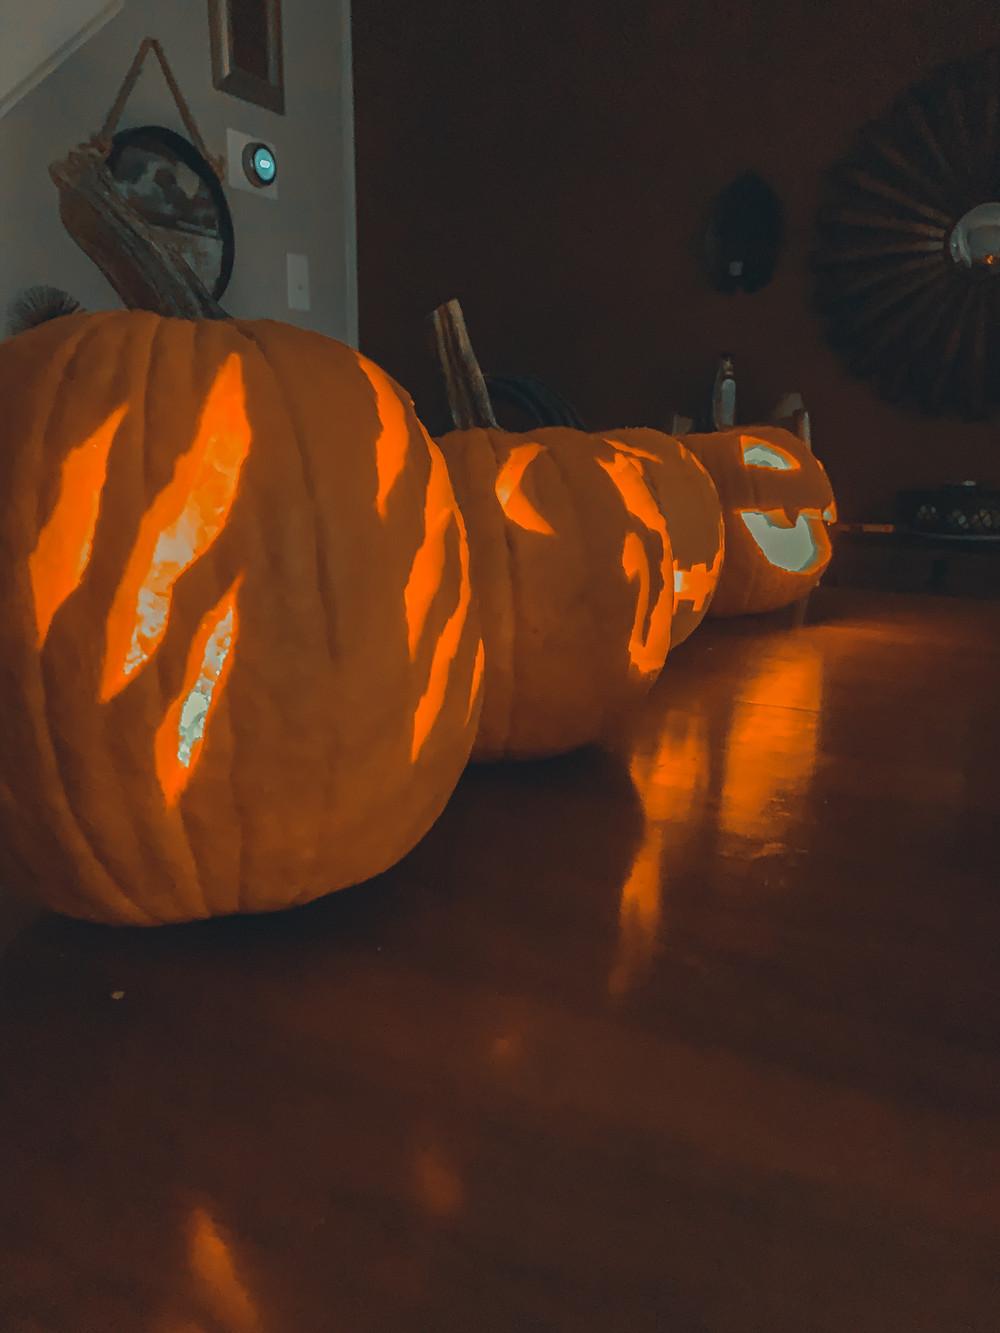 pumpkins jack-o-lanterns